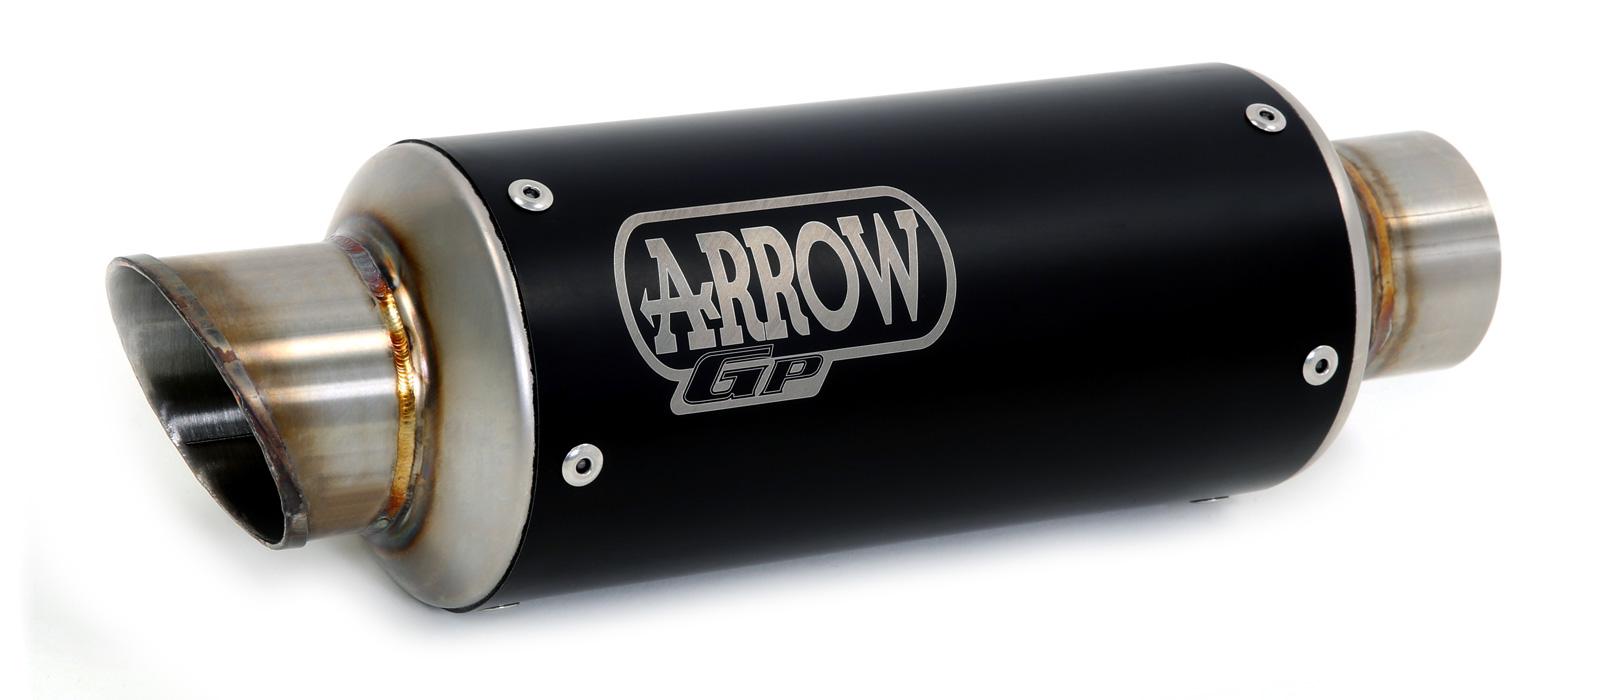 【T-ポイント5倍】 Arrow GP2 Arrow YZF-R3 2015-2016 フルエキ GP2 フルエキ ステンレスダーク/ステンレスエンド 71022GPI+71629MI, 西彼町:3c84e652 --- ceremonialdovesoftidewater.com